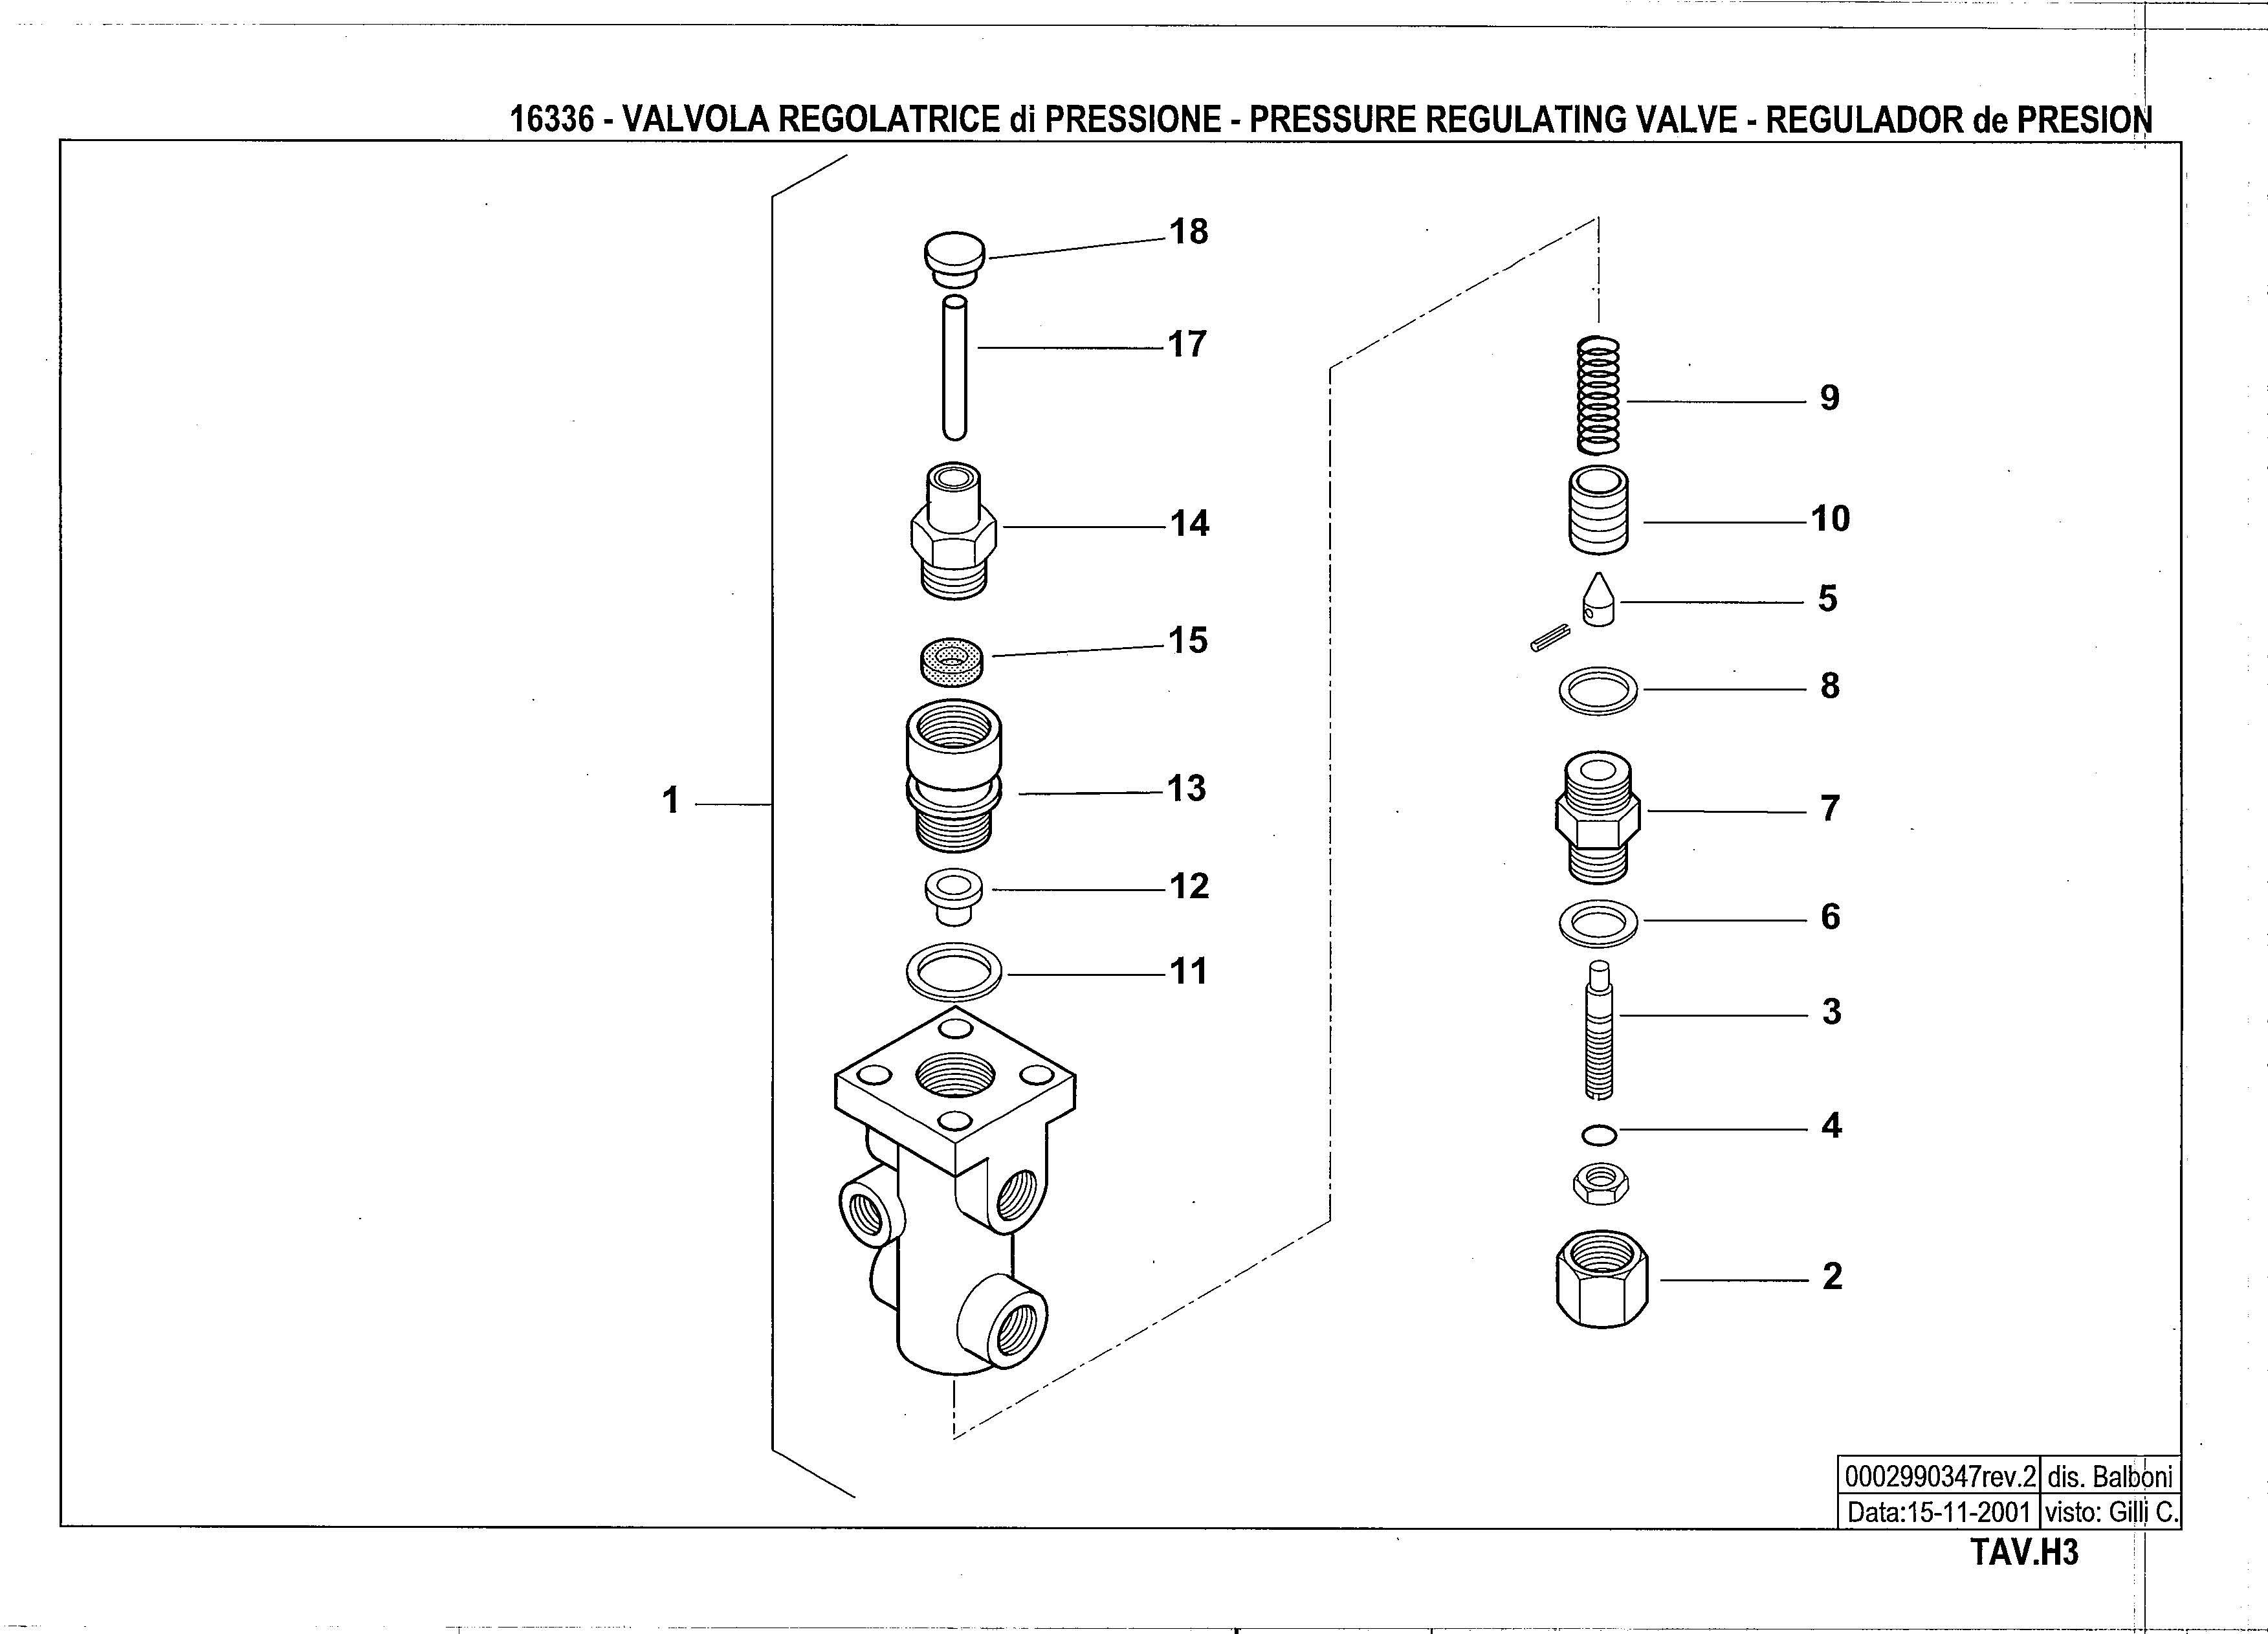 Регулятор давления жидкого топлива H3 16336 2 20011115